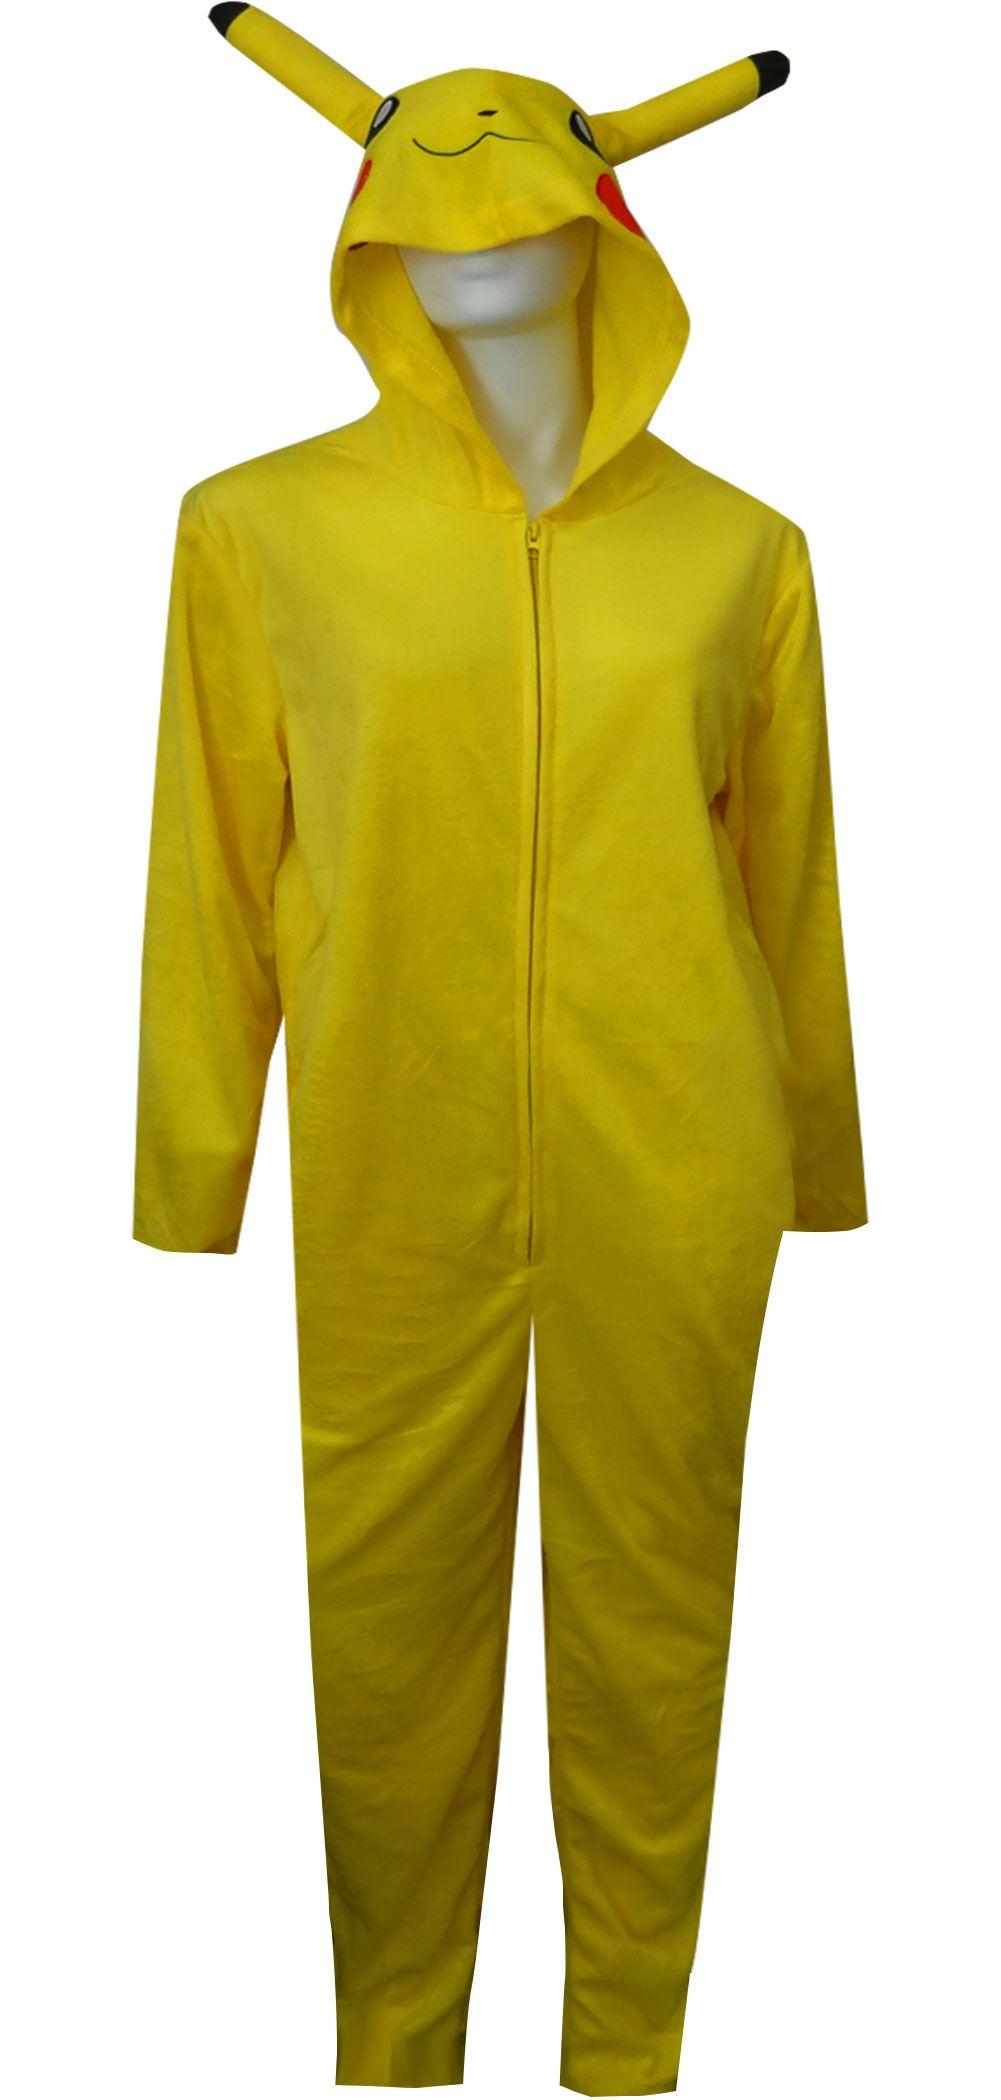 WebUndies.com Pokemon Pikachu One Piece Union Suit Pajama  8c9e4c488